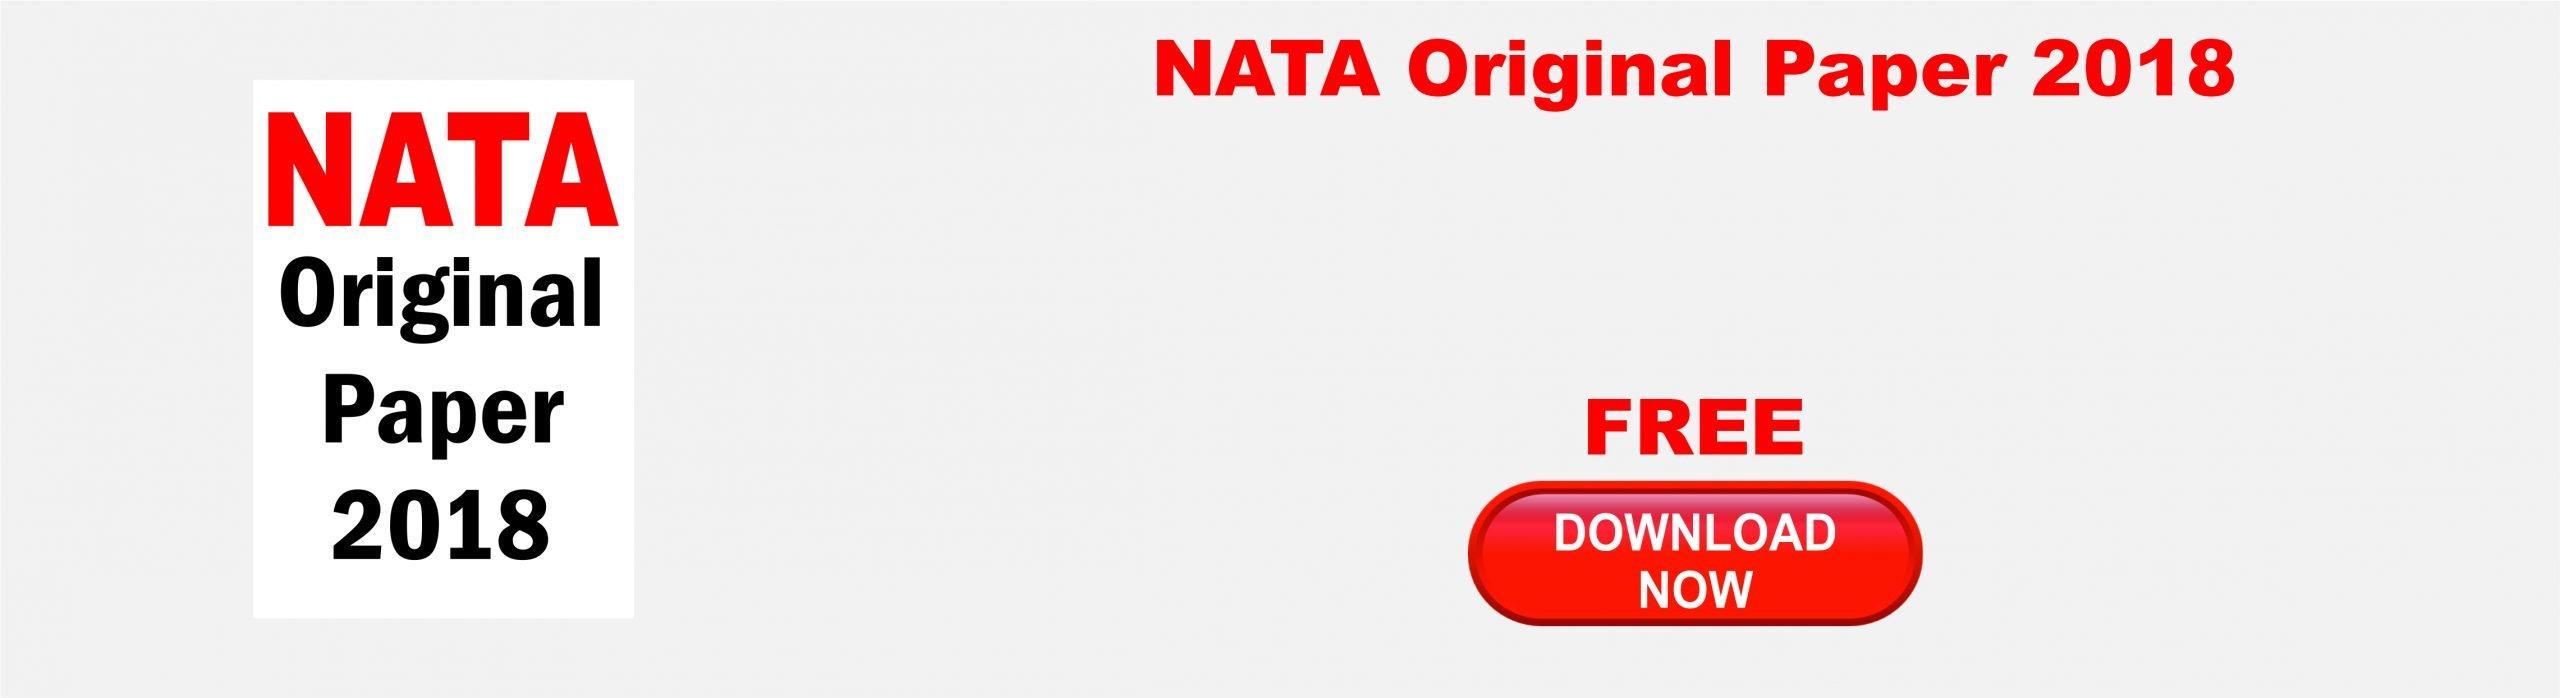 NATA Original Paper 2018